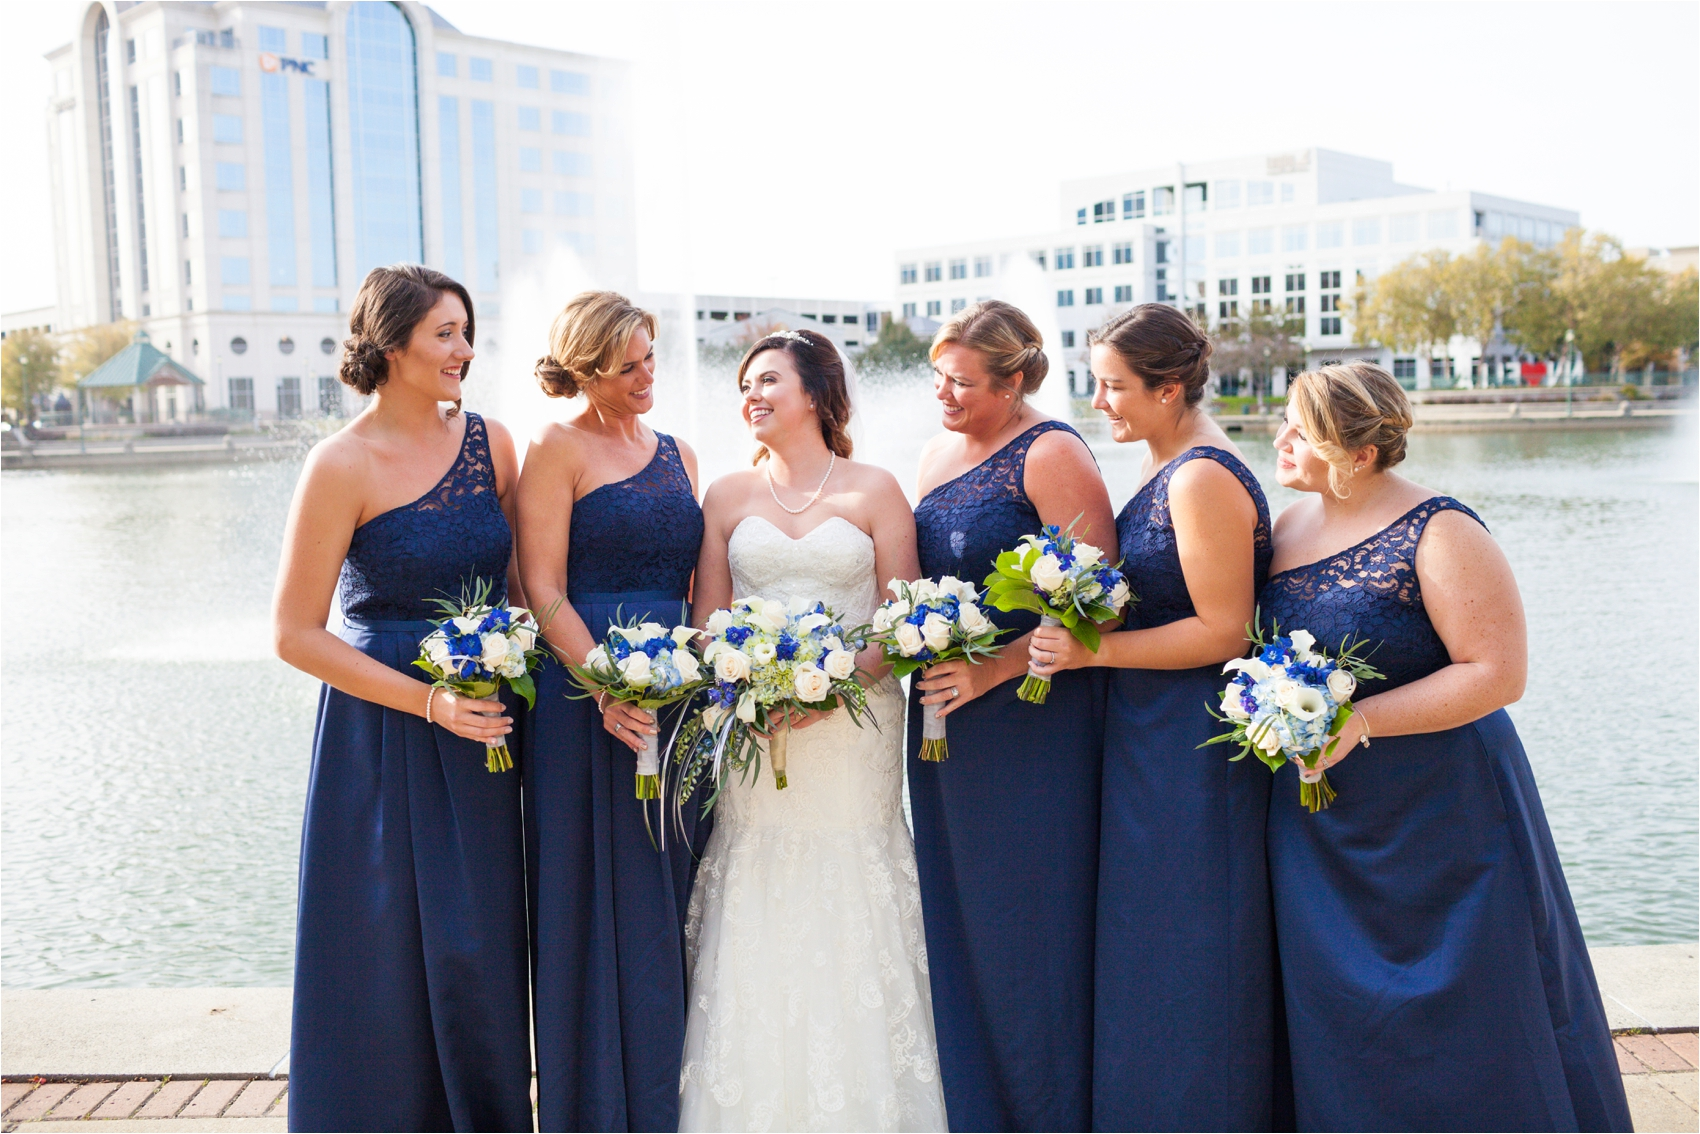 Newport-News-Winter-Wonderland-Wedding_0118.jpg